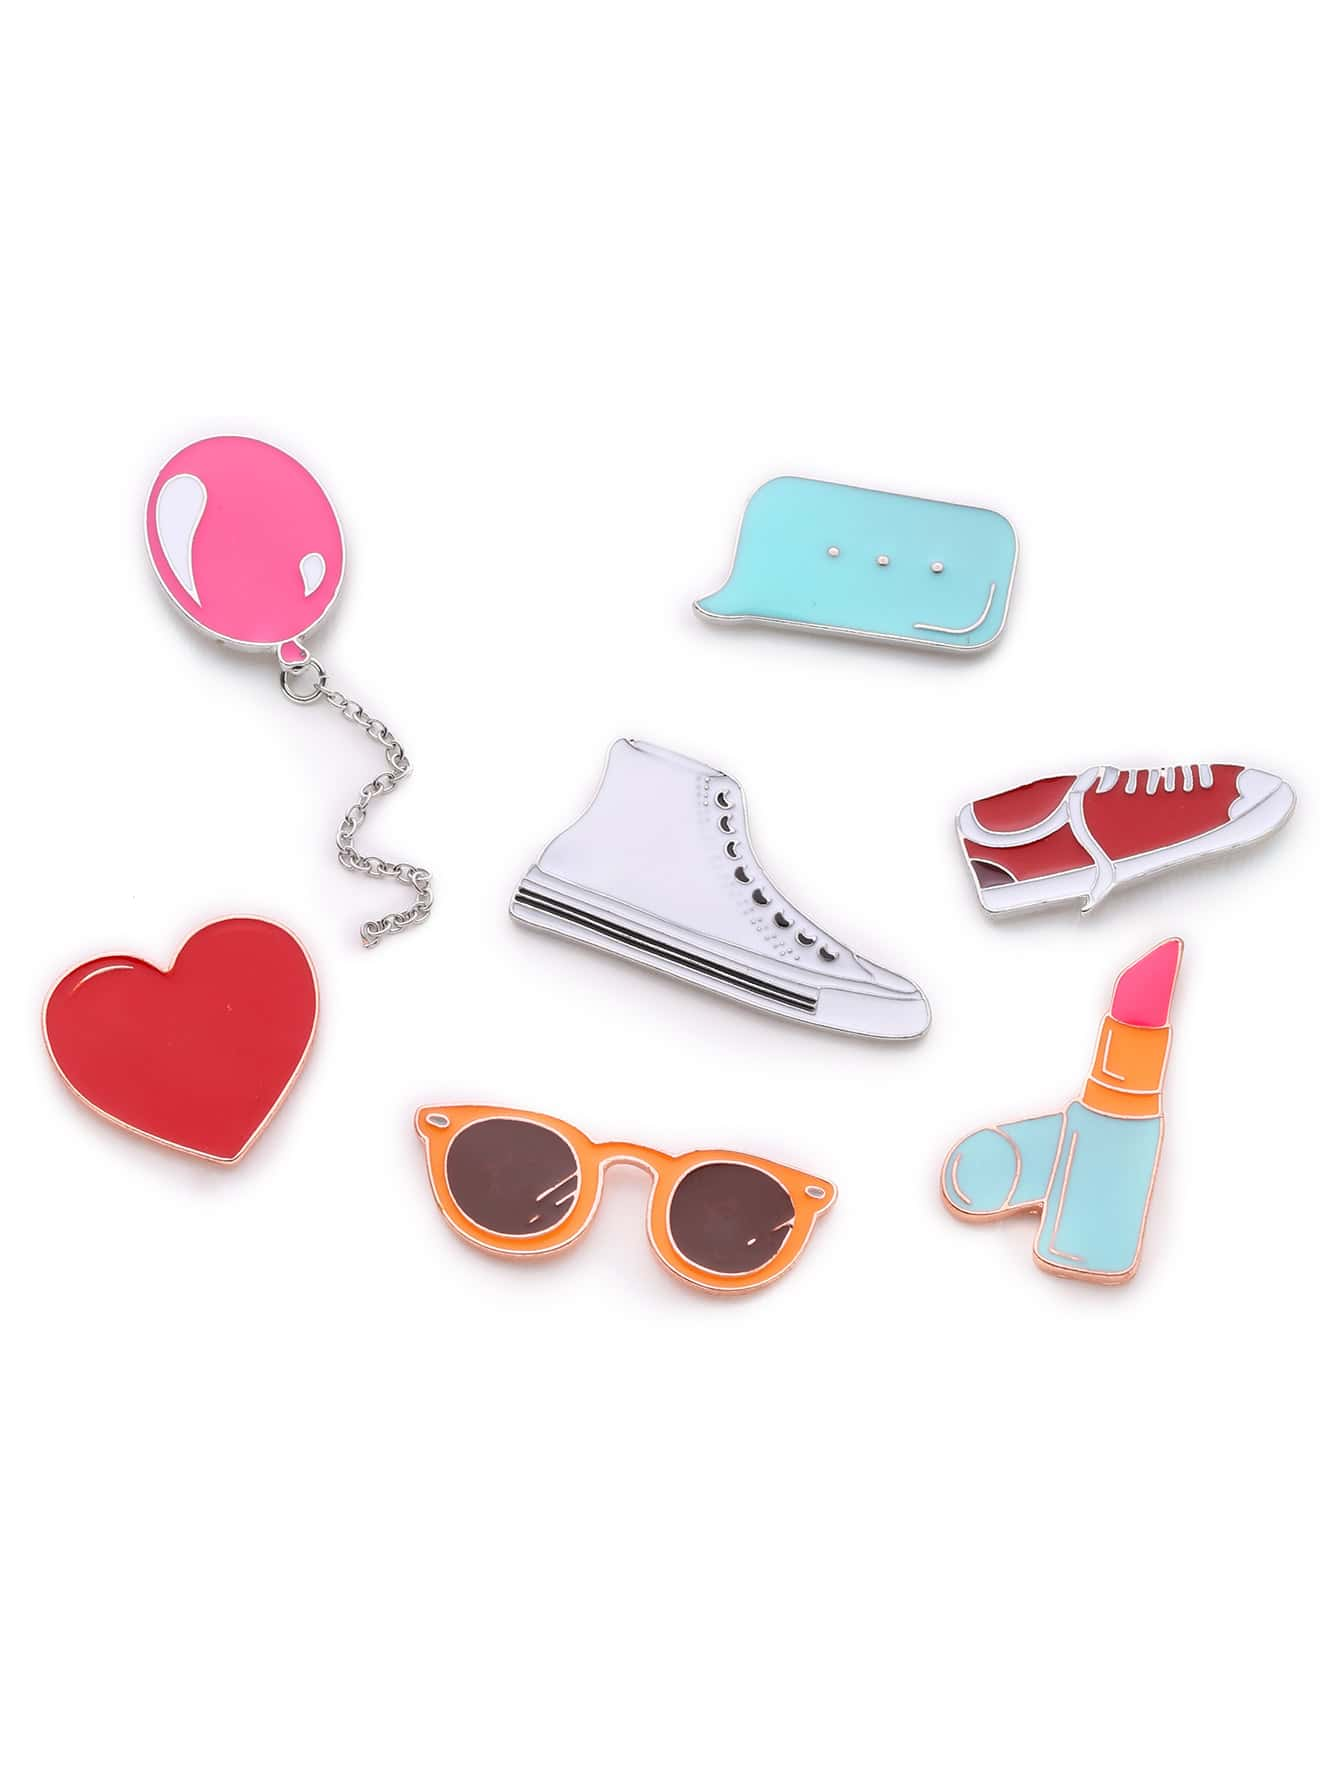 Shoes & Balloon Design Brooch Set